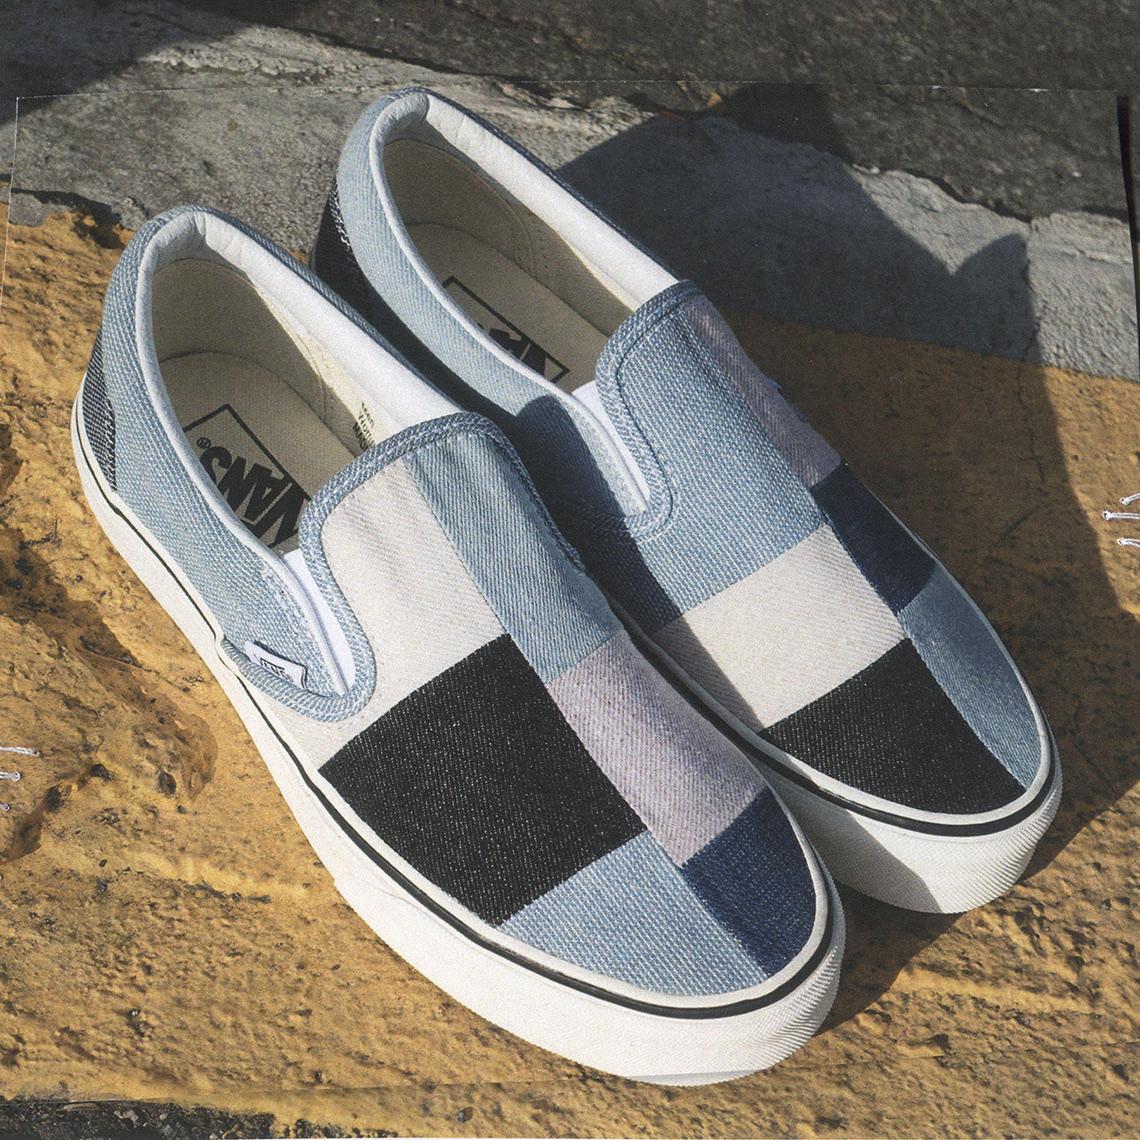 Vans Denim Patchwork Collection Release Info Sneakernews Com